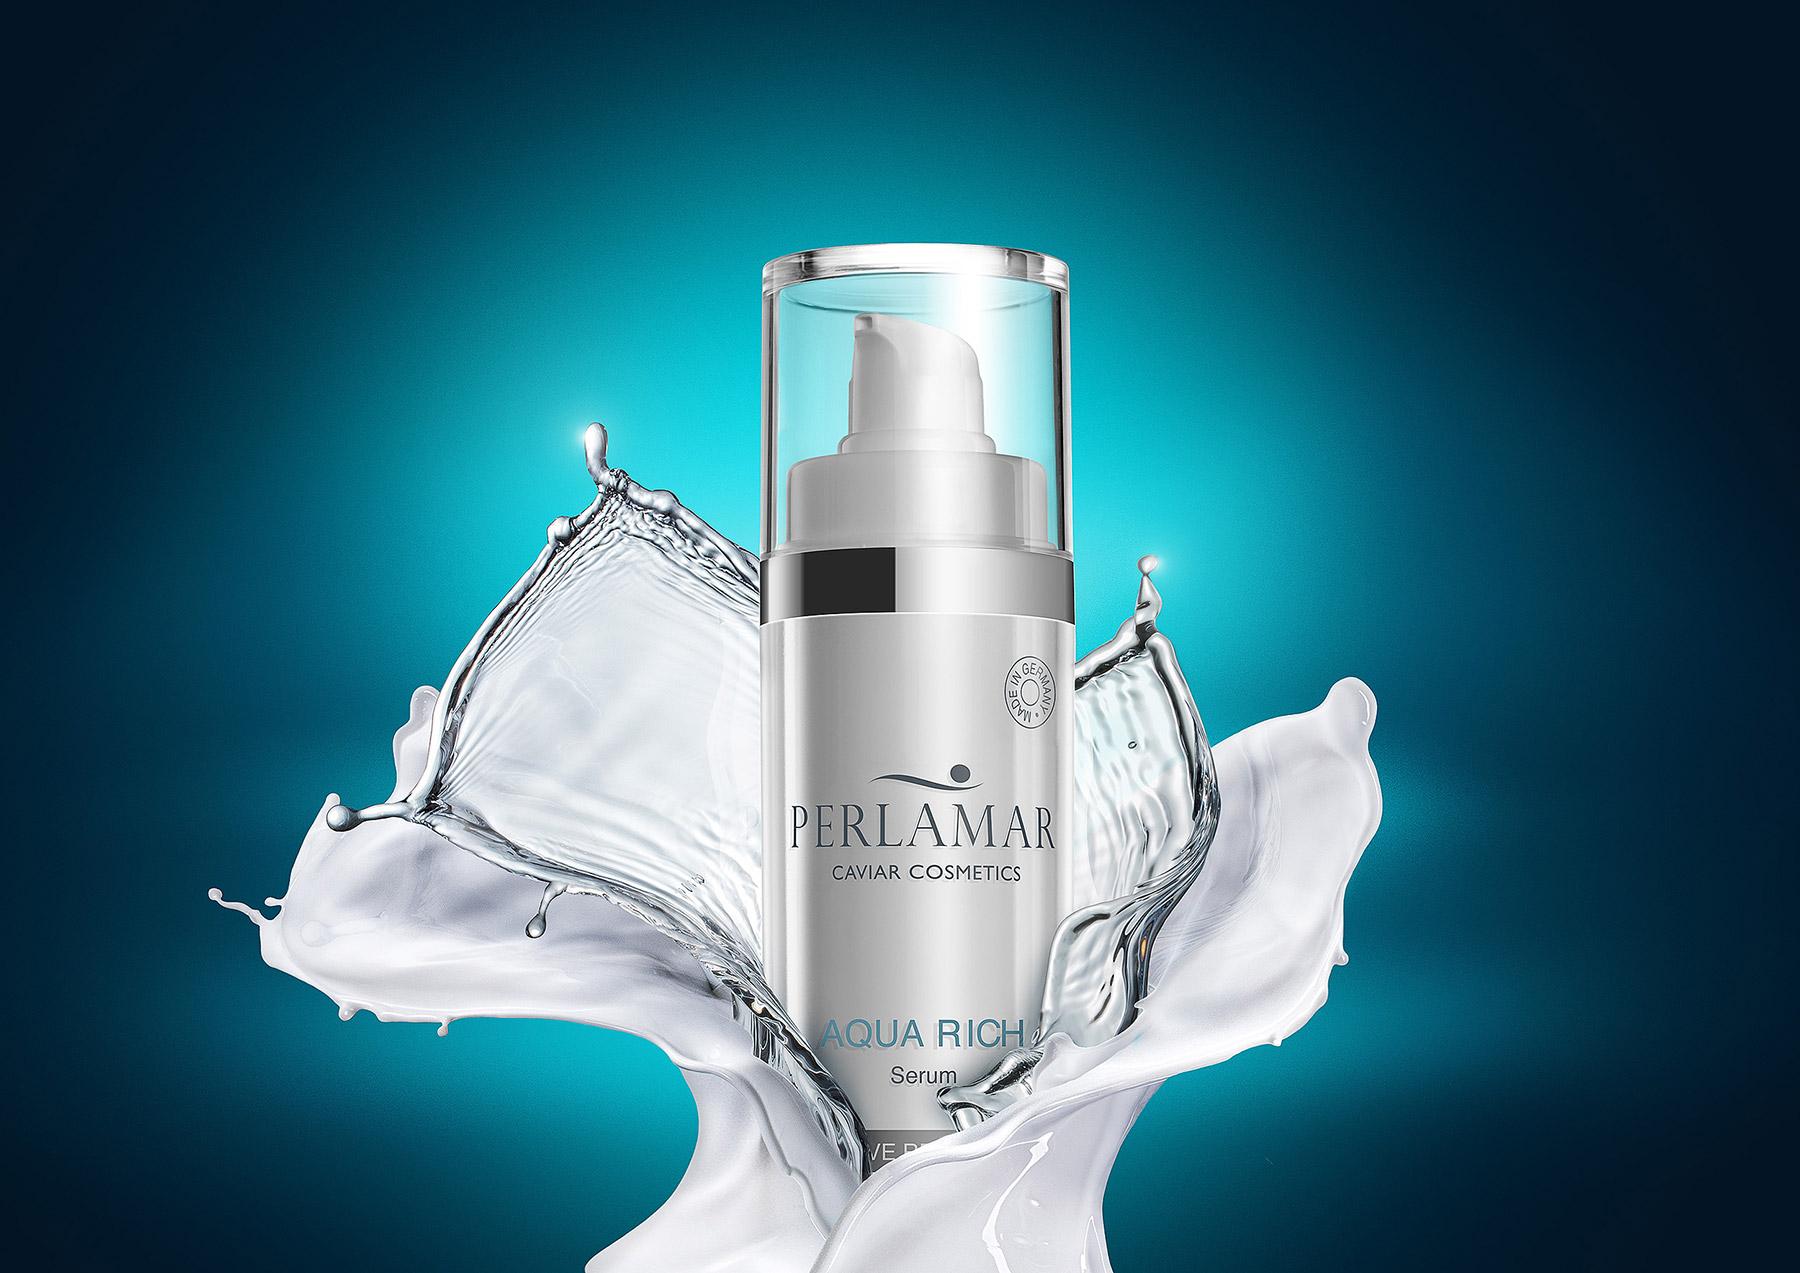 perlamar-caviar-cosmetics-serum-Produktfotograf-Werbefotograf-Stilllife-Fotograf-Muenchen